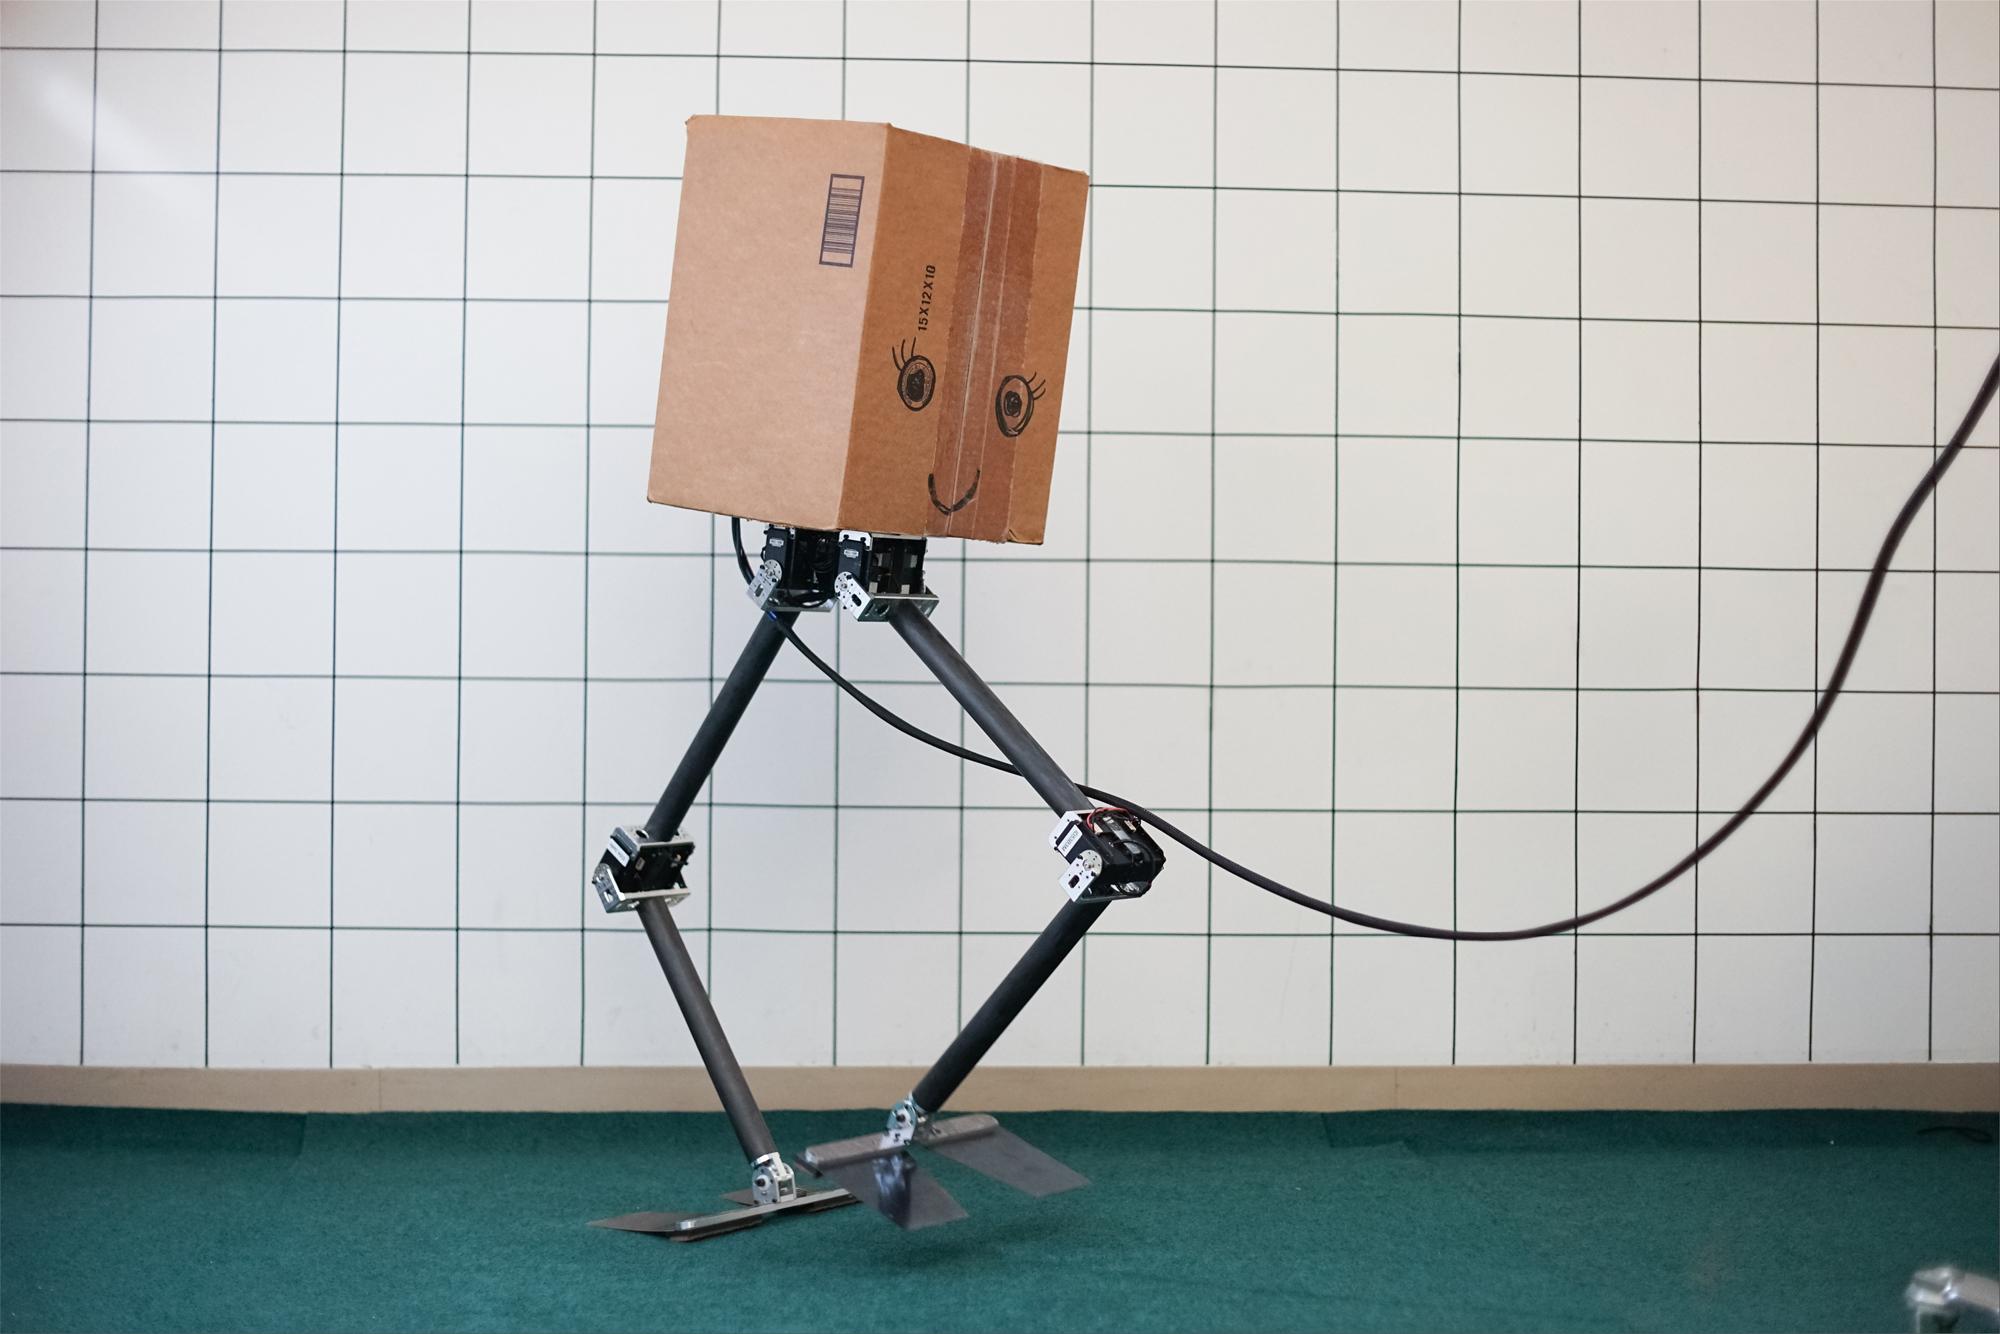 SKKU·UCLA Robot Opening Day에서 체험할 다양한 로봇